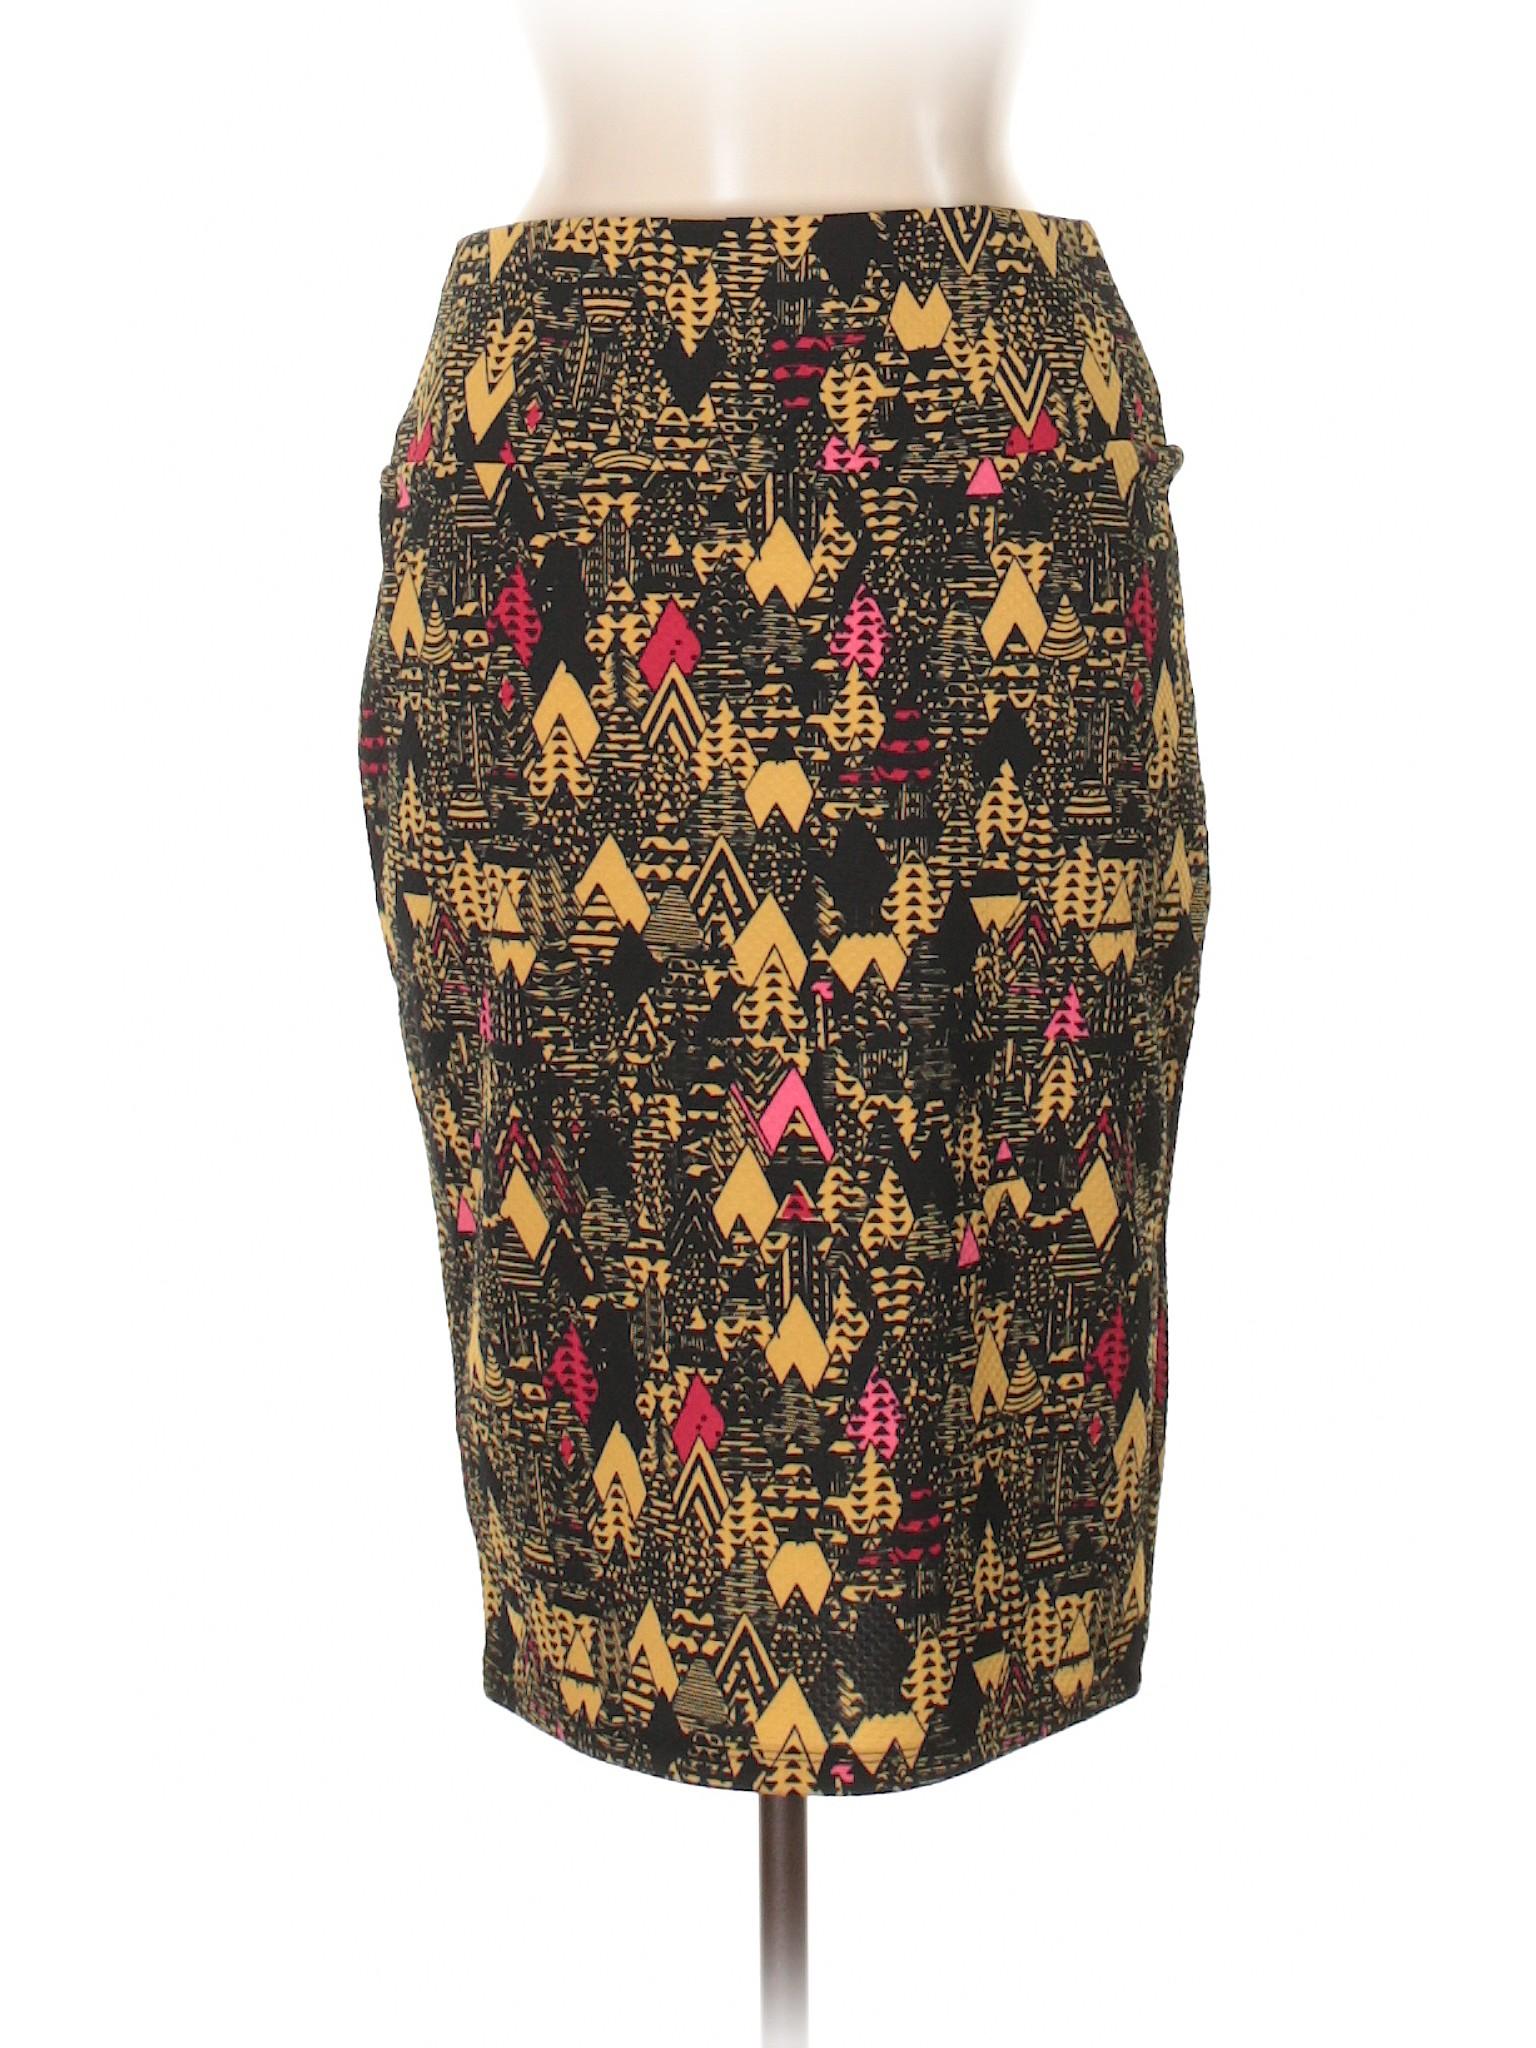 Skirt Skirt Casual Boutique Lularoe Boutique Lularoe Boutique Casual Lularoe 5aqAU4wSF